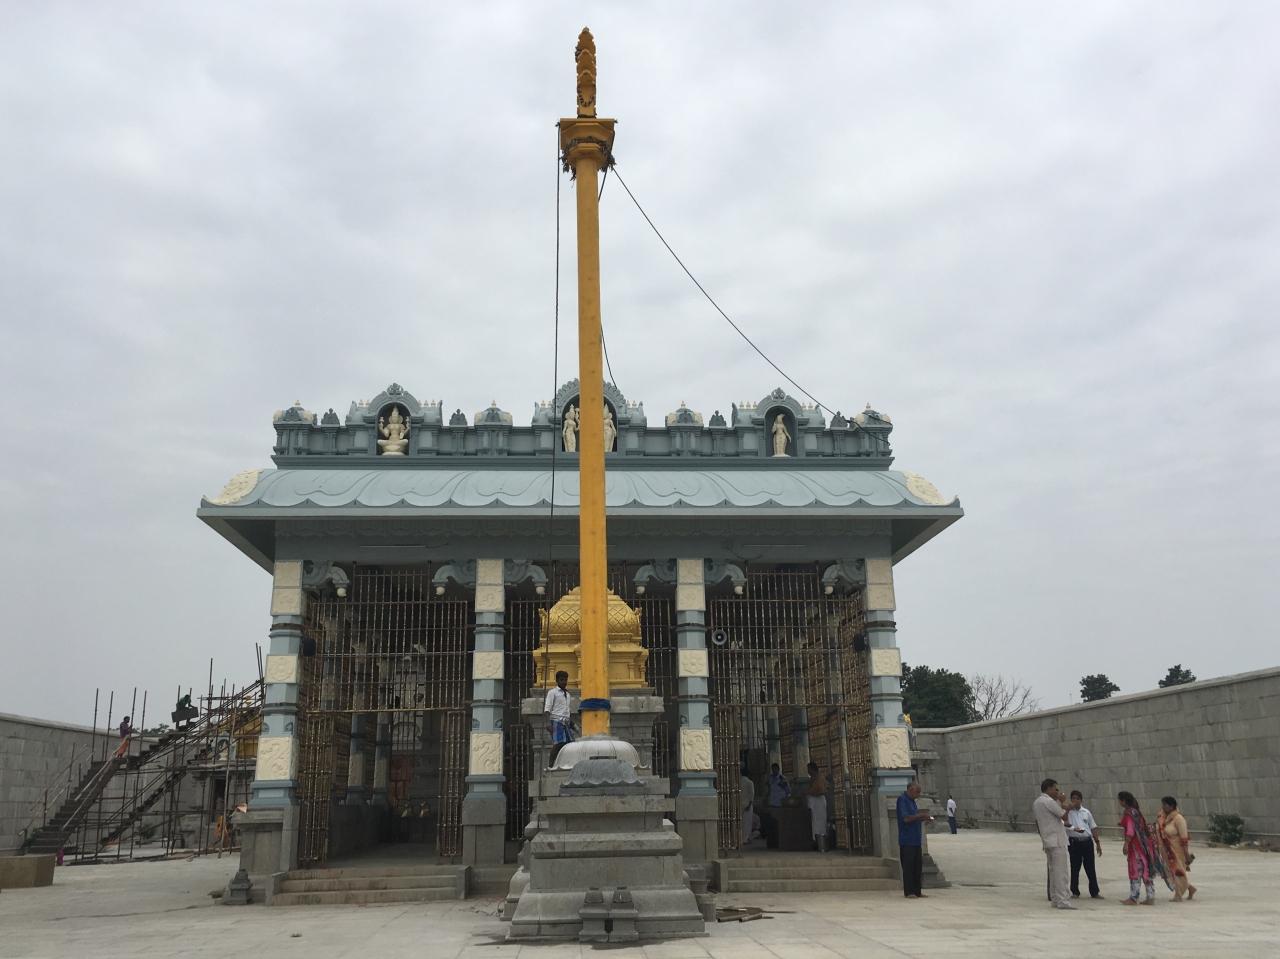 The newly-opened Shri Venkateshwara Tirupati Balaji temple in Kurukshetra